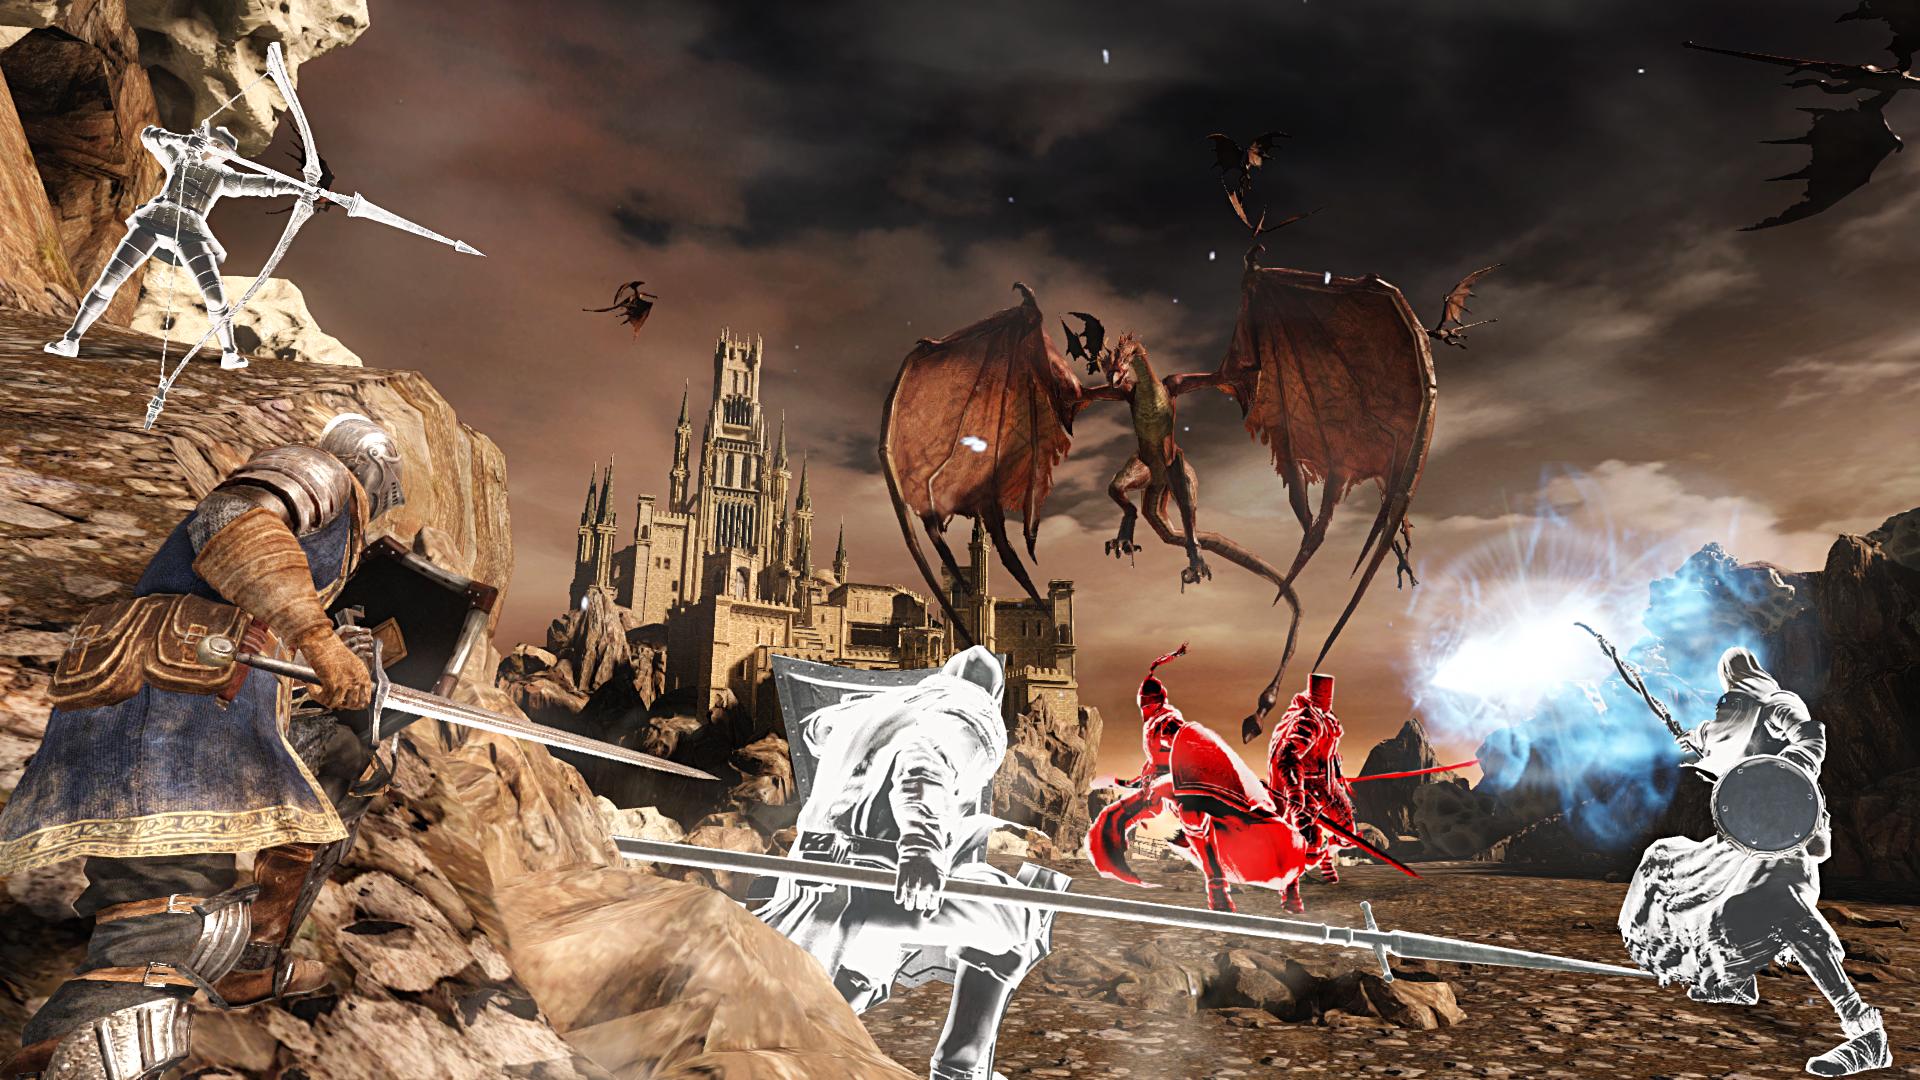 Obrazem: Temné dungeony, kostlivci a monstra z Dark Souls 2: Scholar of the First Sin 107560